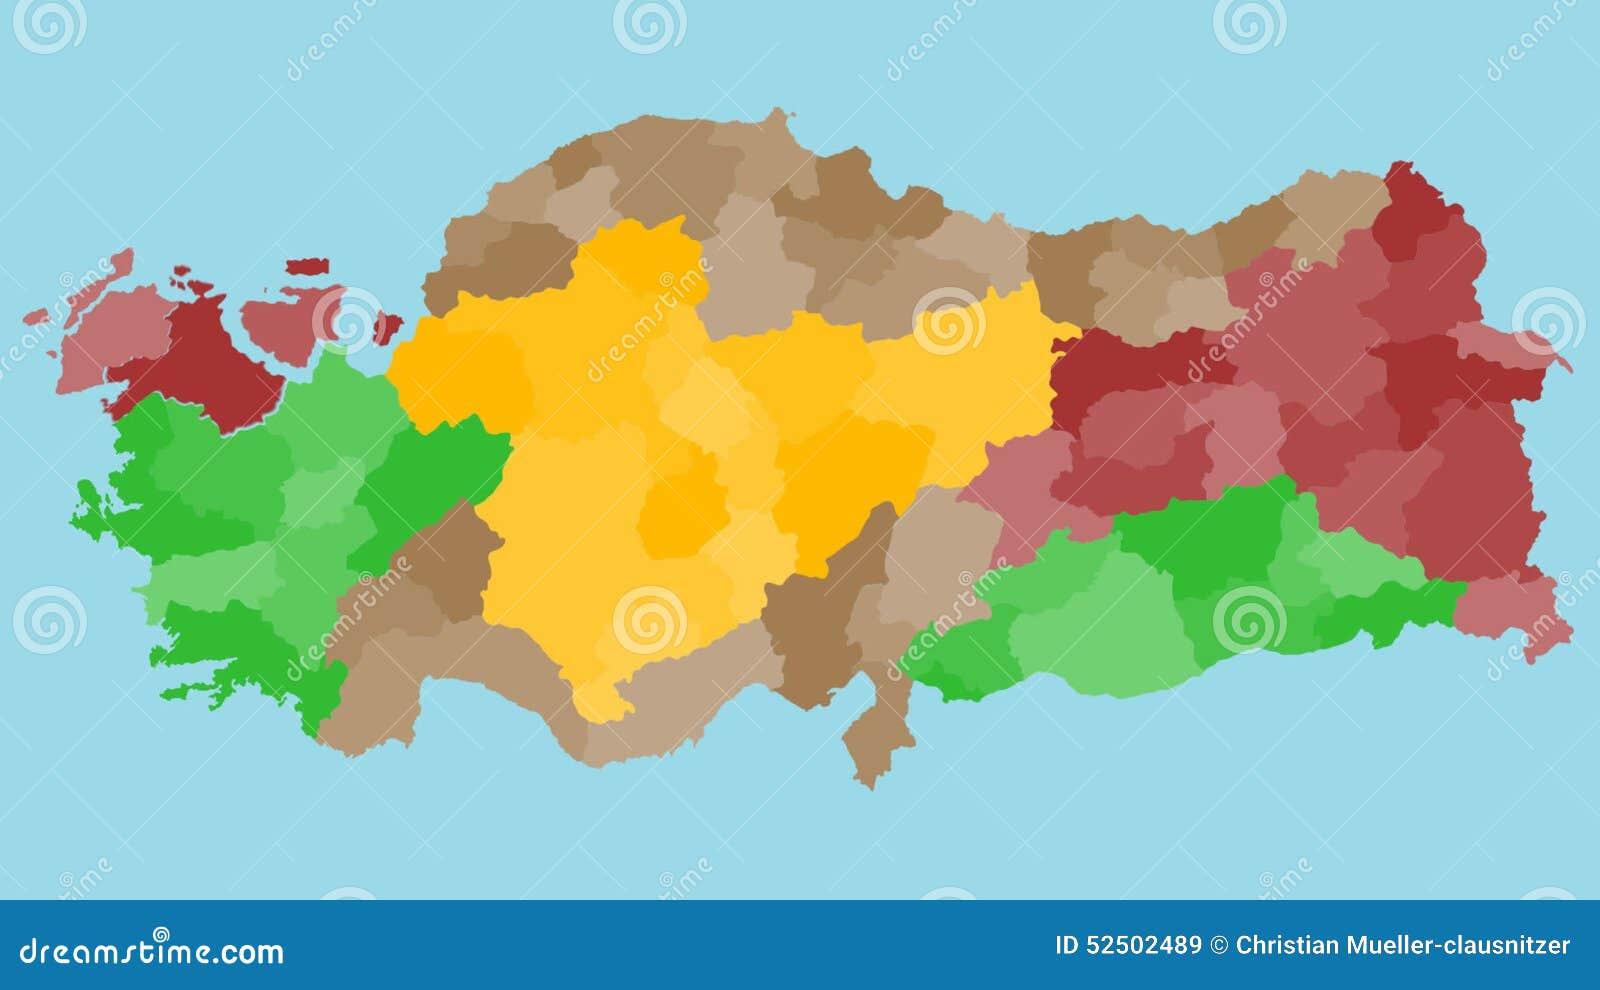 map of turkey stock video illustration of animation 52502489 world map time lapse world map animation colors